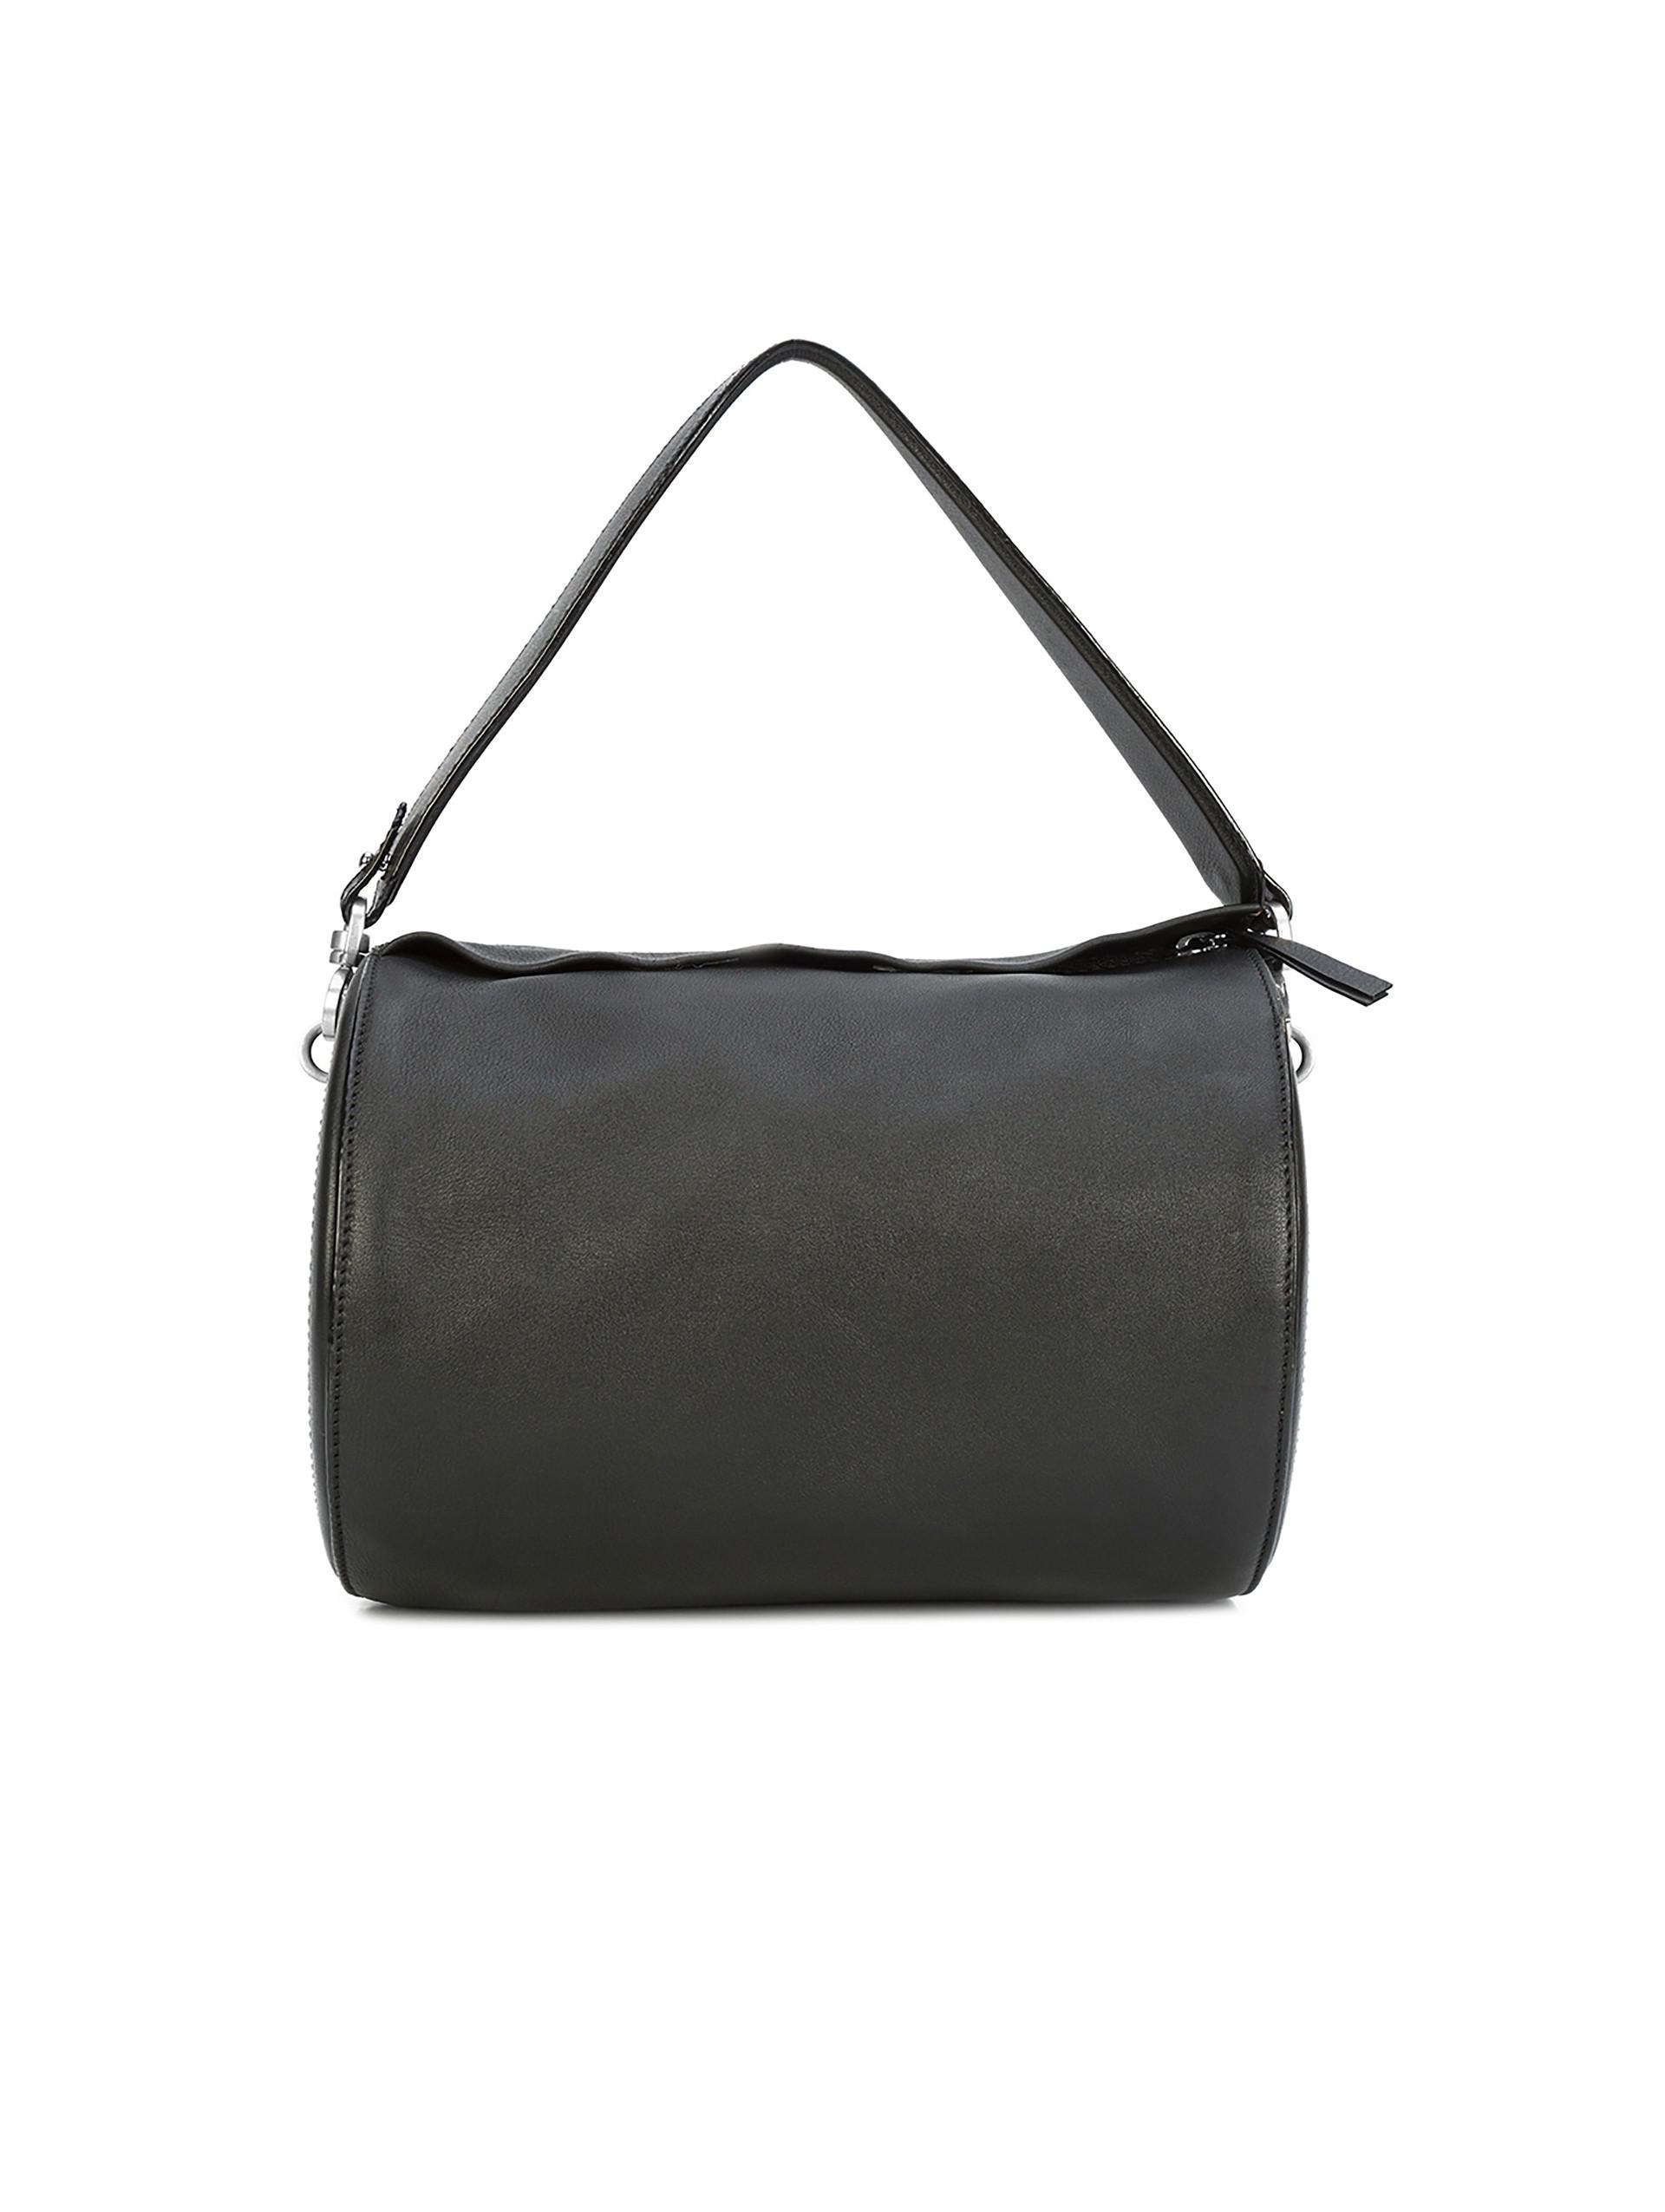 4b2a56e1c9 Lyst - Oscar De La Renta Black Leather Medium Battery Bag in Black